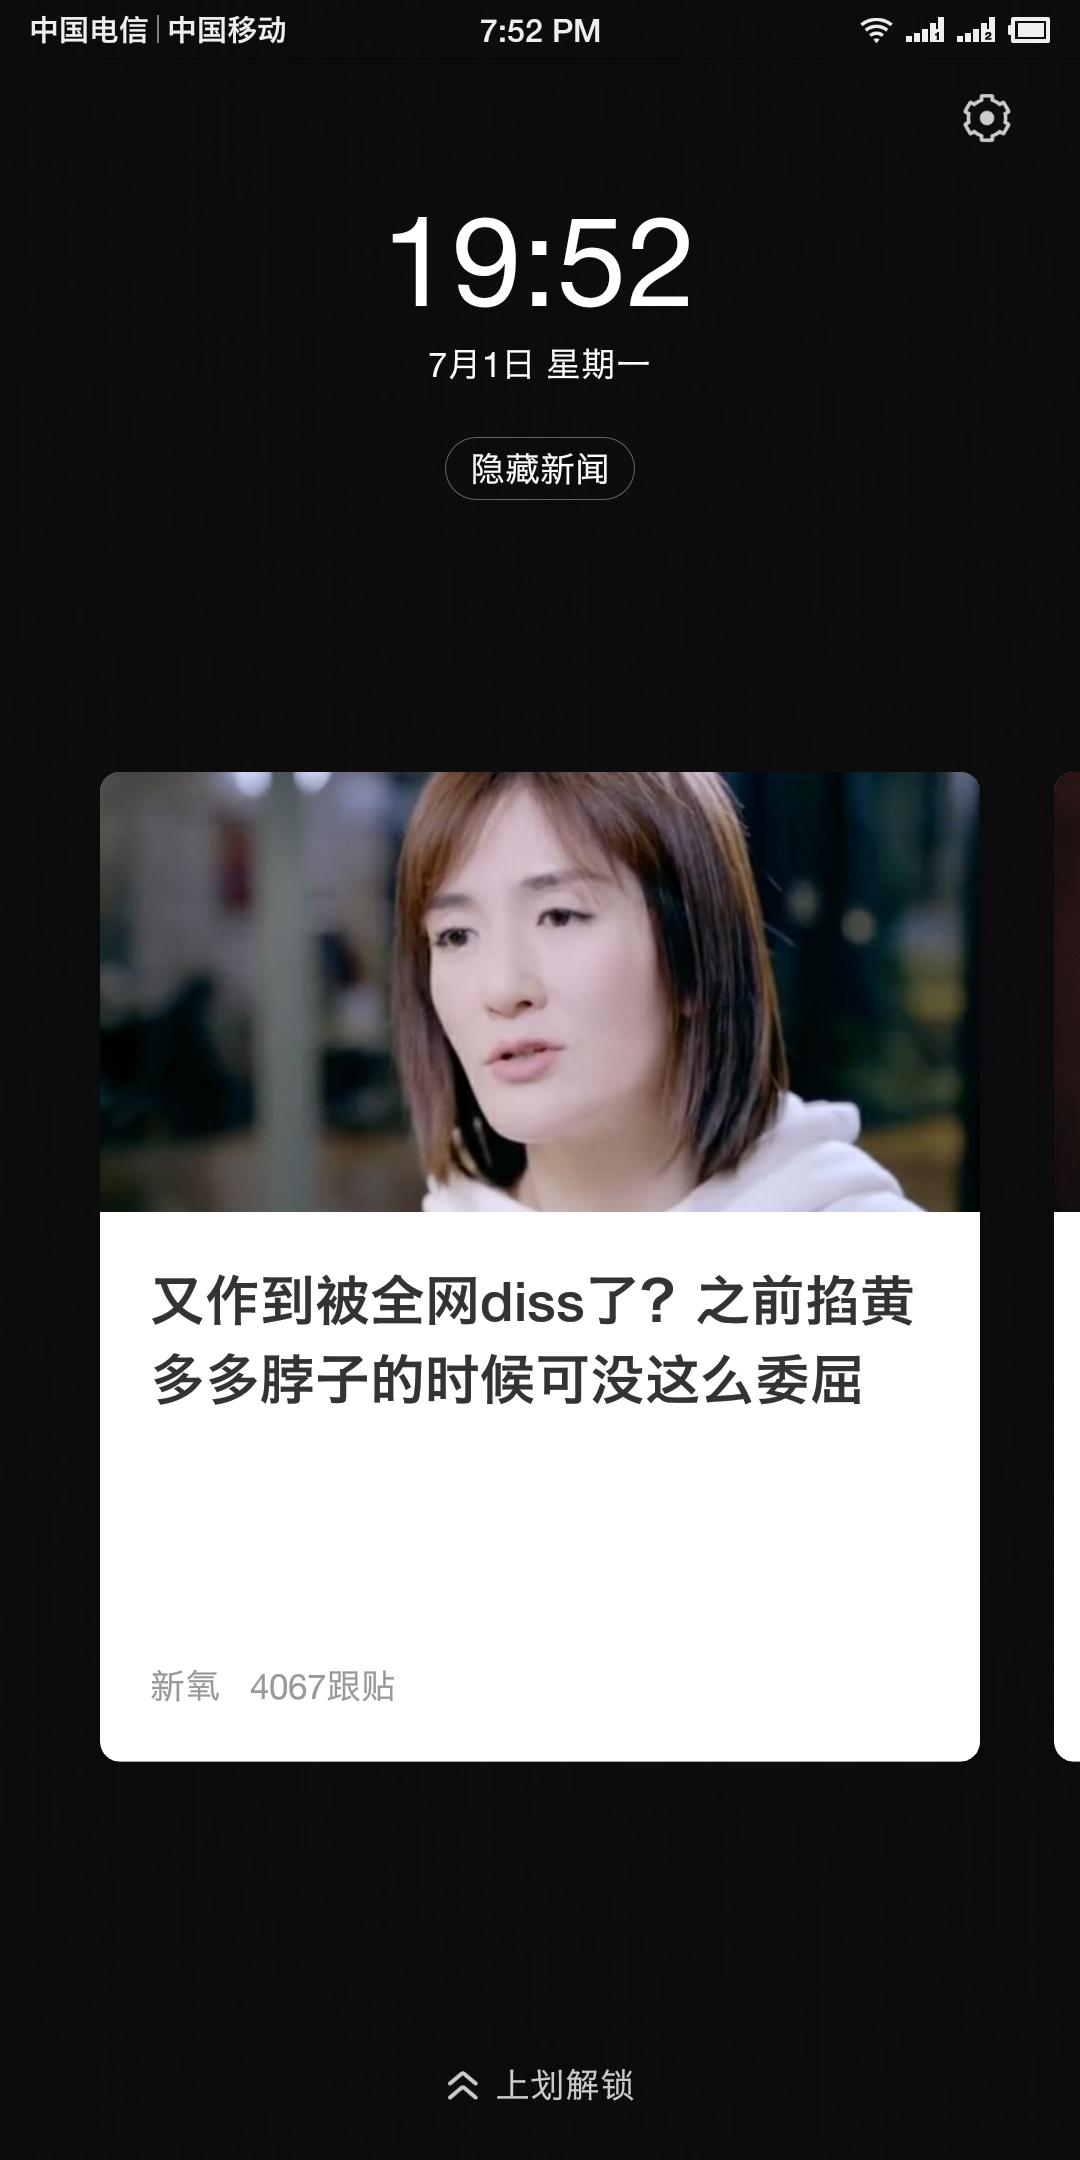 Screenshot_2019-07-01-19-52-08-581_网易新闻.png